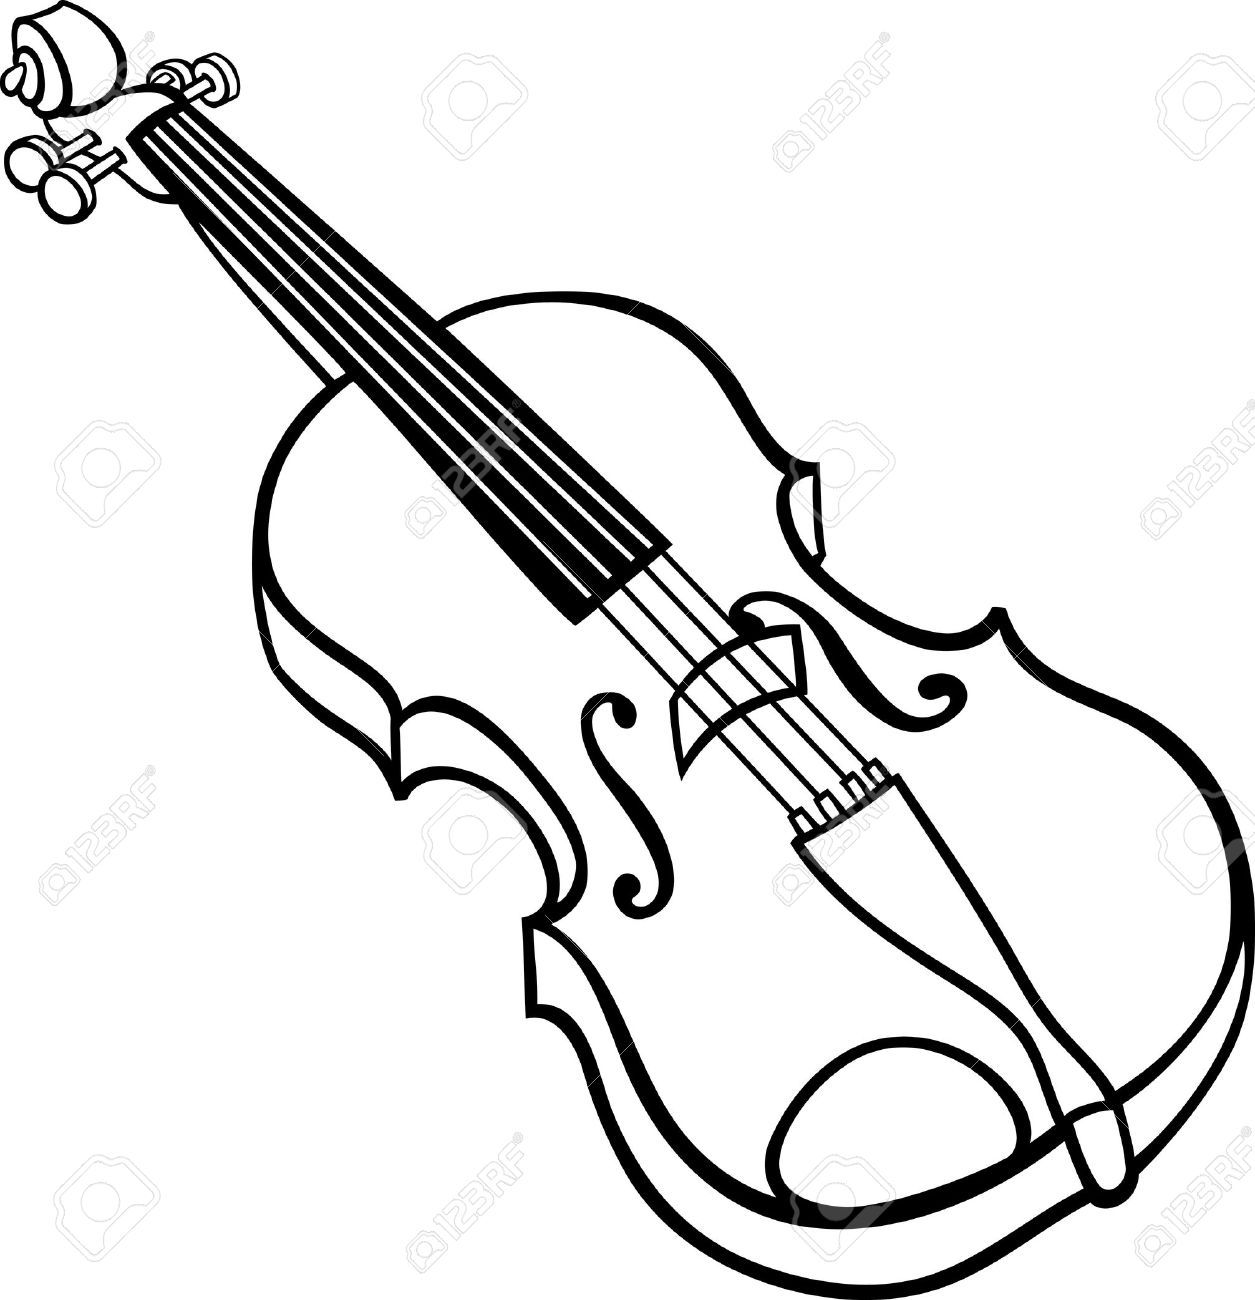 Line Drawing Violin : Black and white cartoon illustration of violin musical